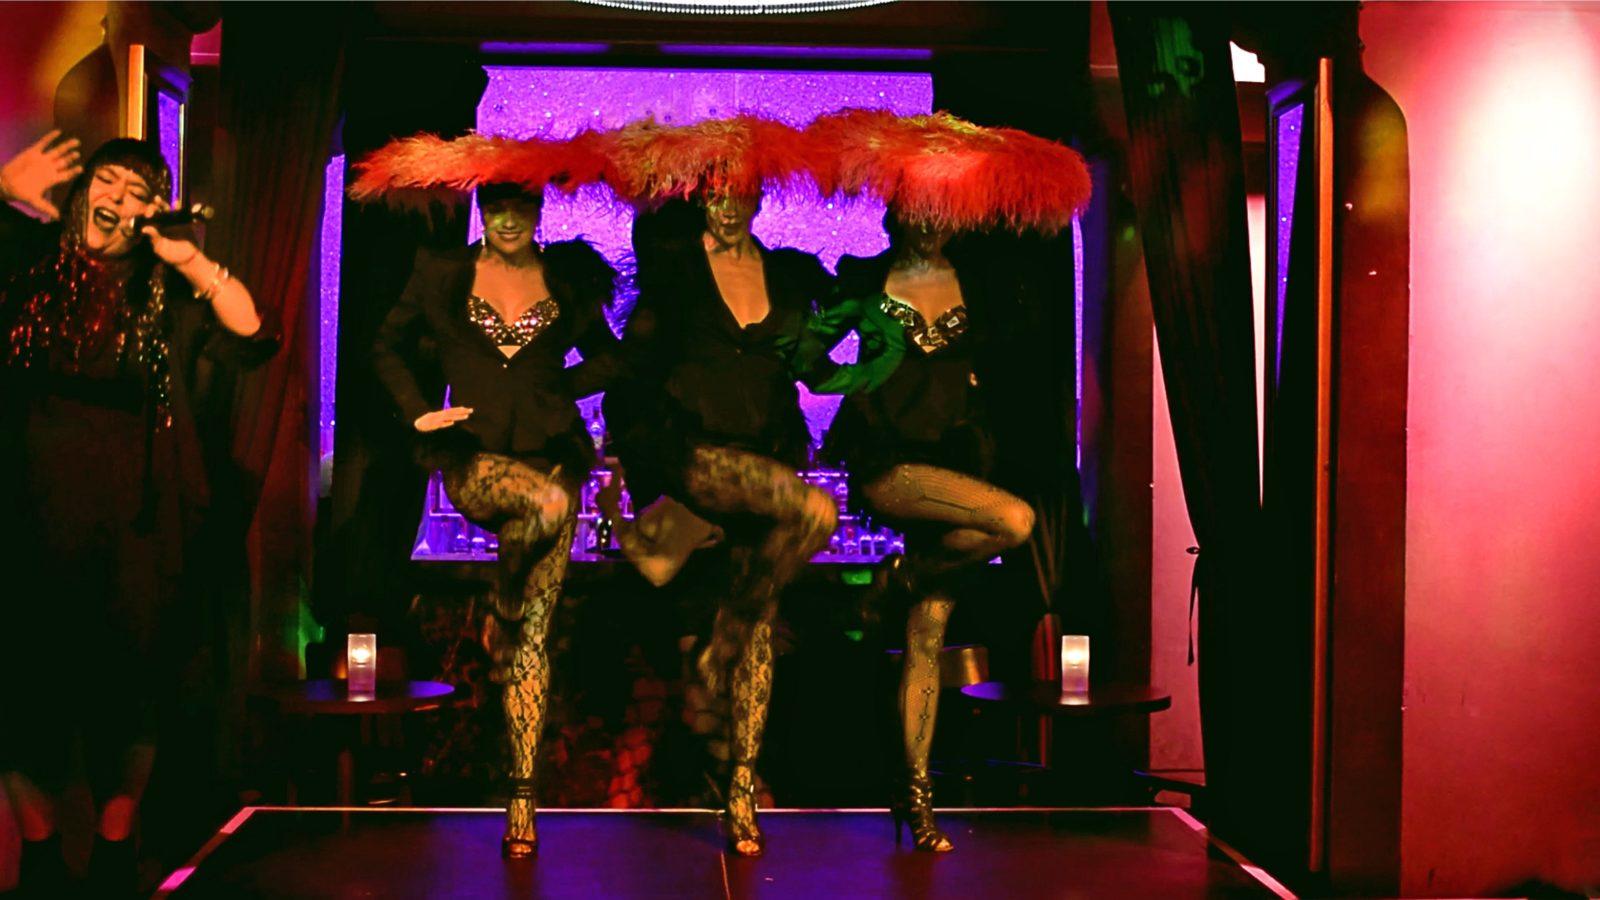 Crystal Boudoir Cabaret Show